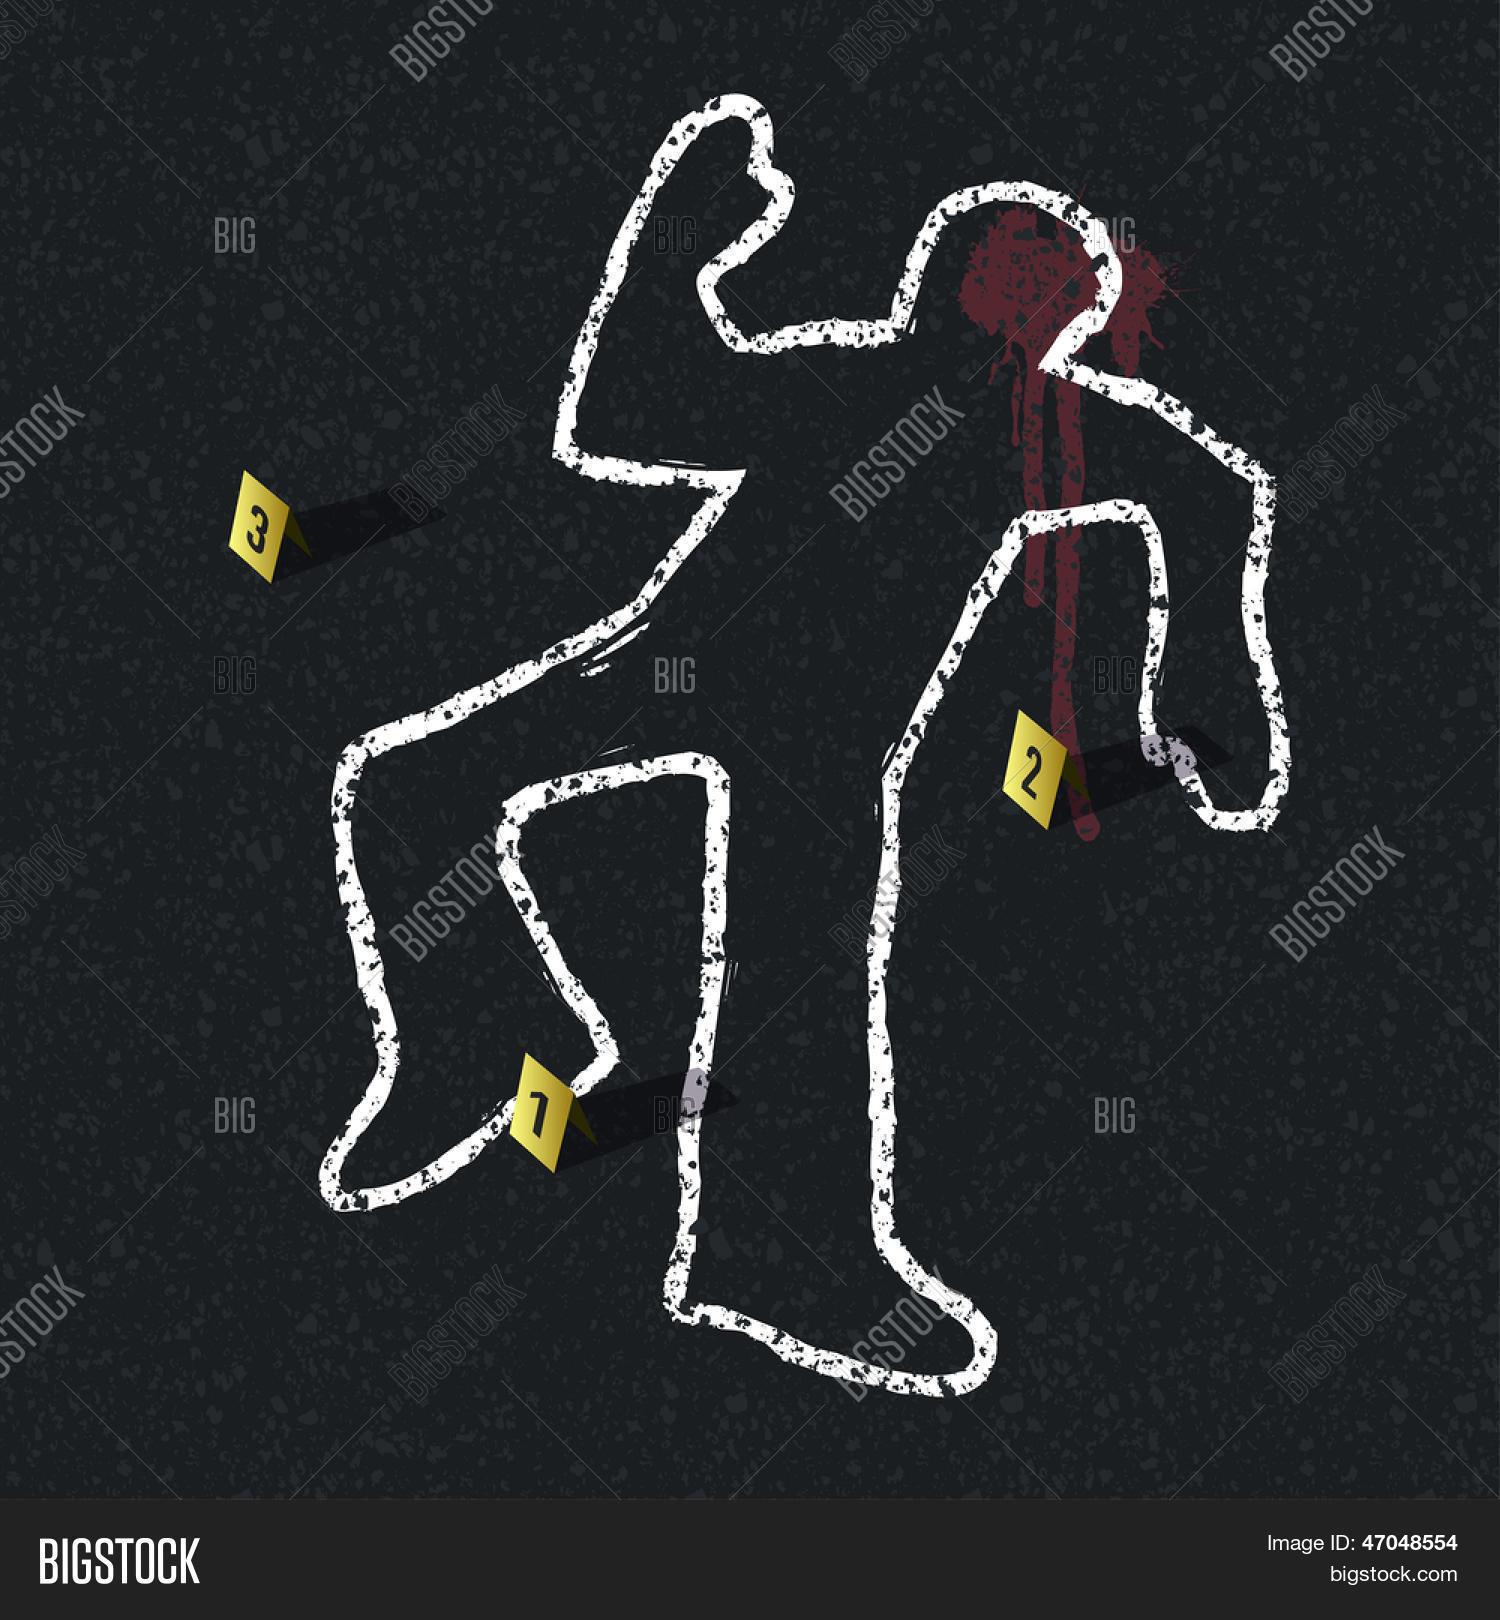 Crime Scene Image & Photo (Free Trial)   Bigstock